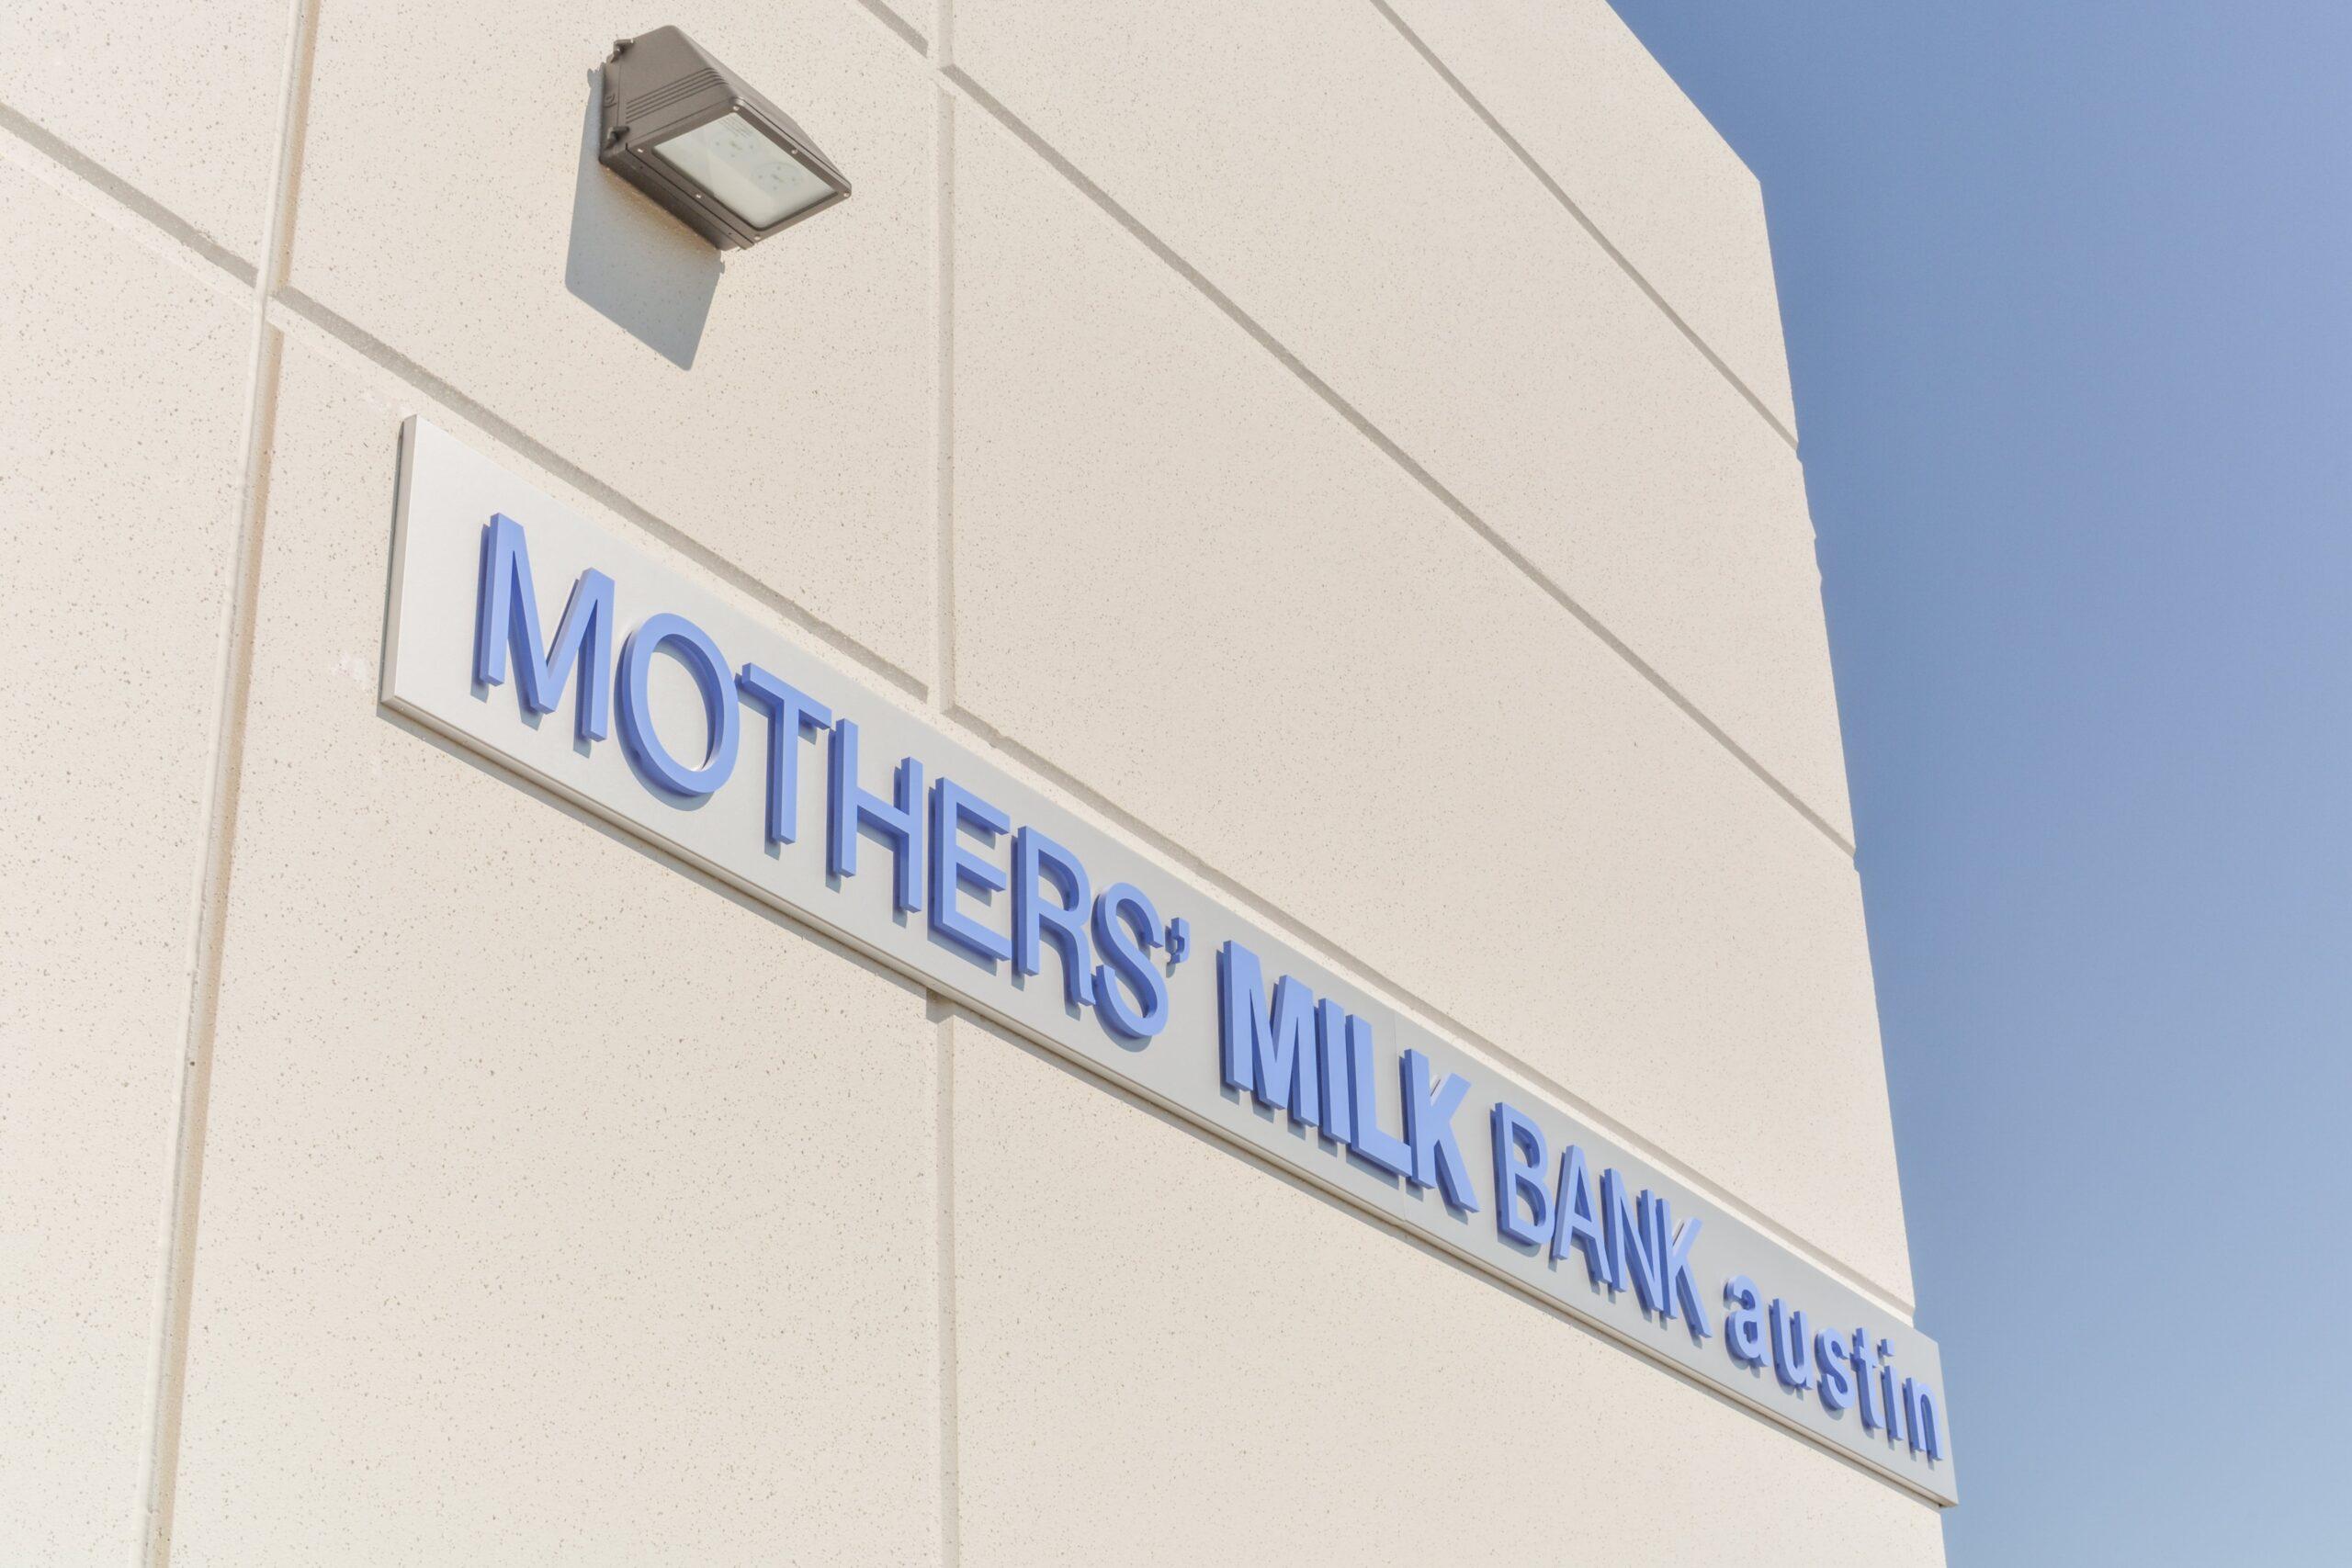 Mothers' Milk Bank Austin Logo on side of building